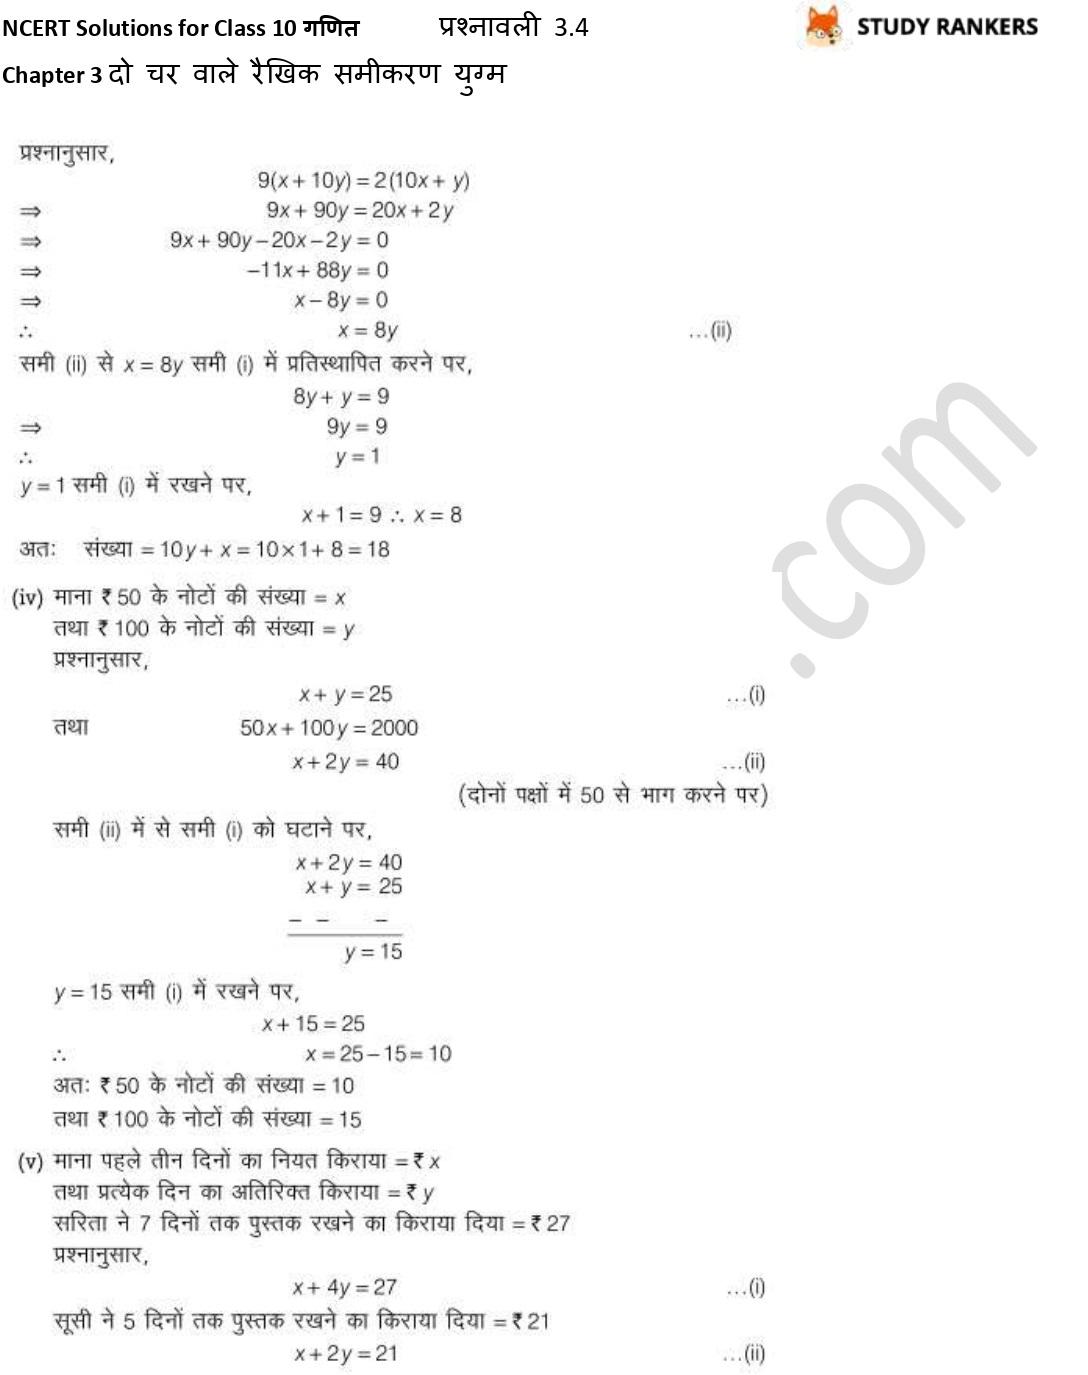 NCERT Solutions for Class 10 Maths Chapter 3 दो चर वाले रैखिक समीकरण युग्म प्रश्नावली 3.4 Part 9